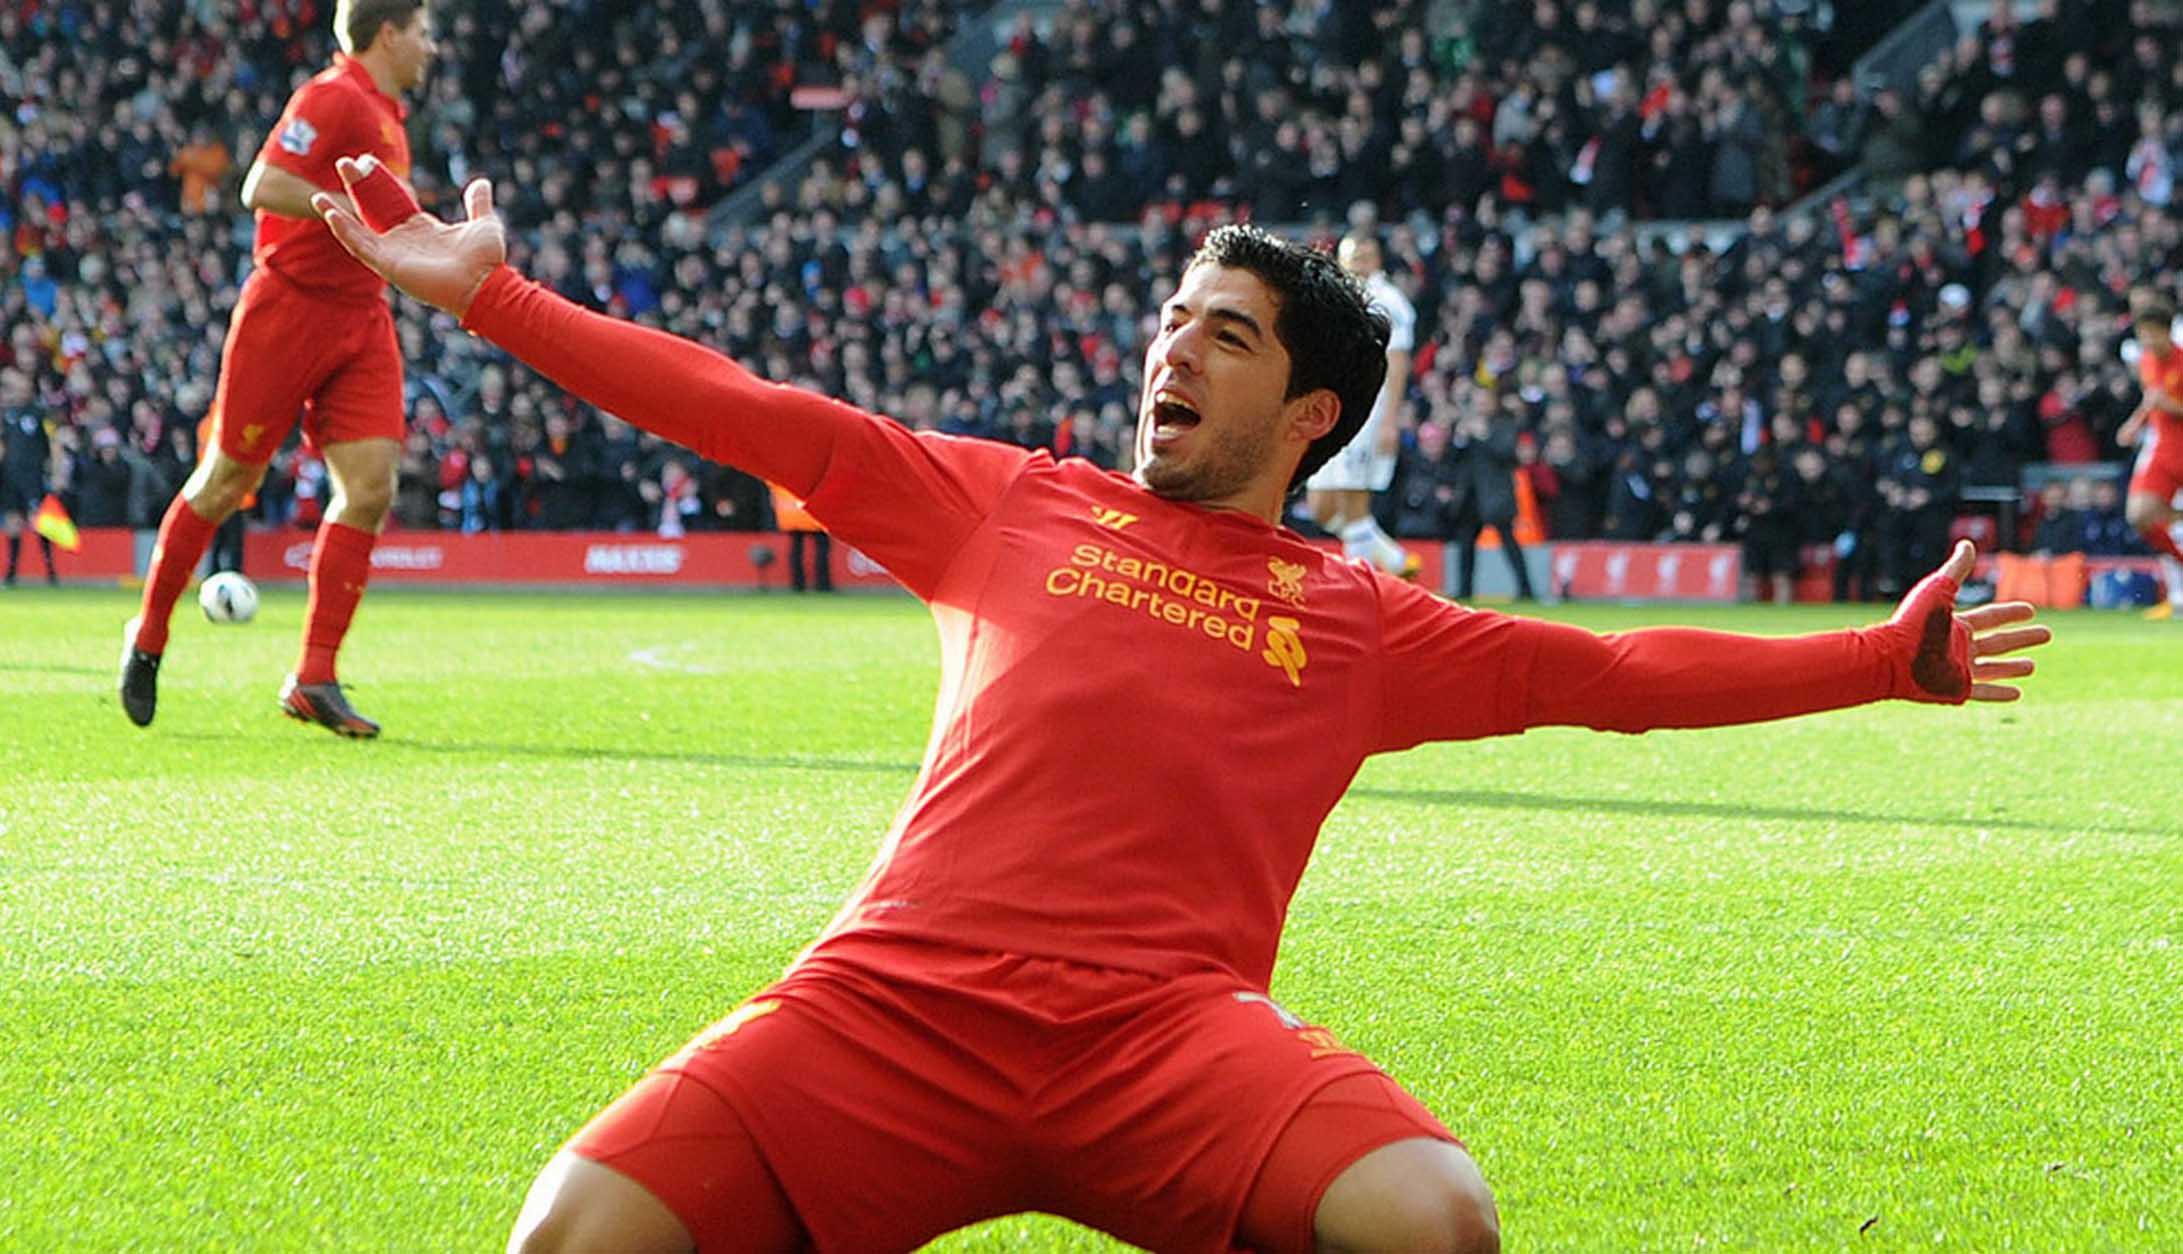 Suarez leaves Liverpool - The 18 Yard Box